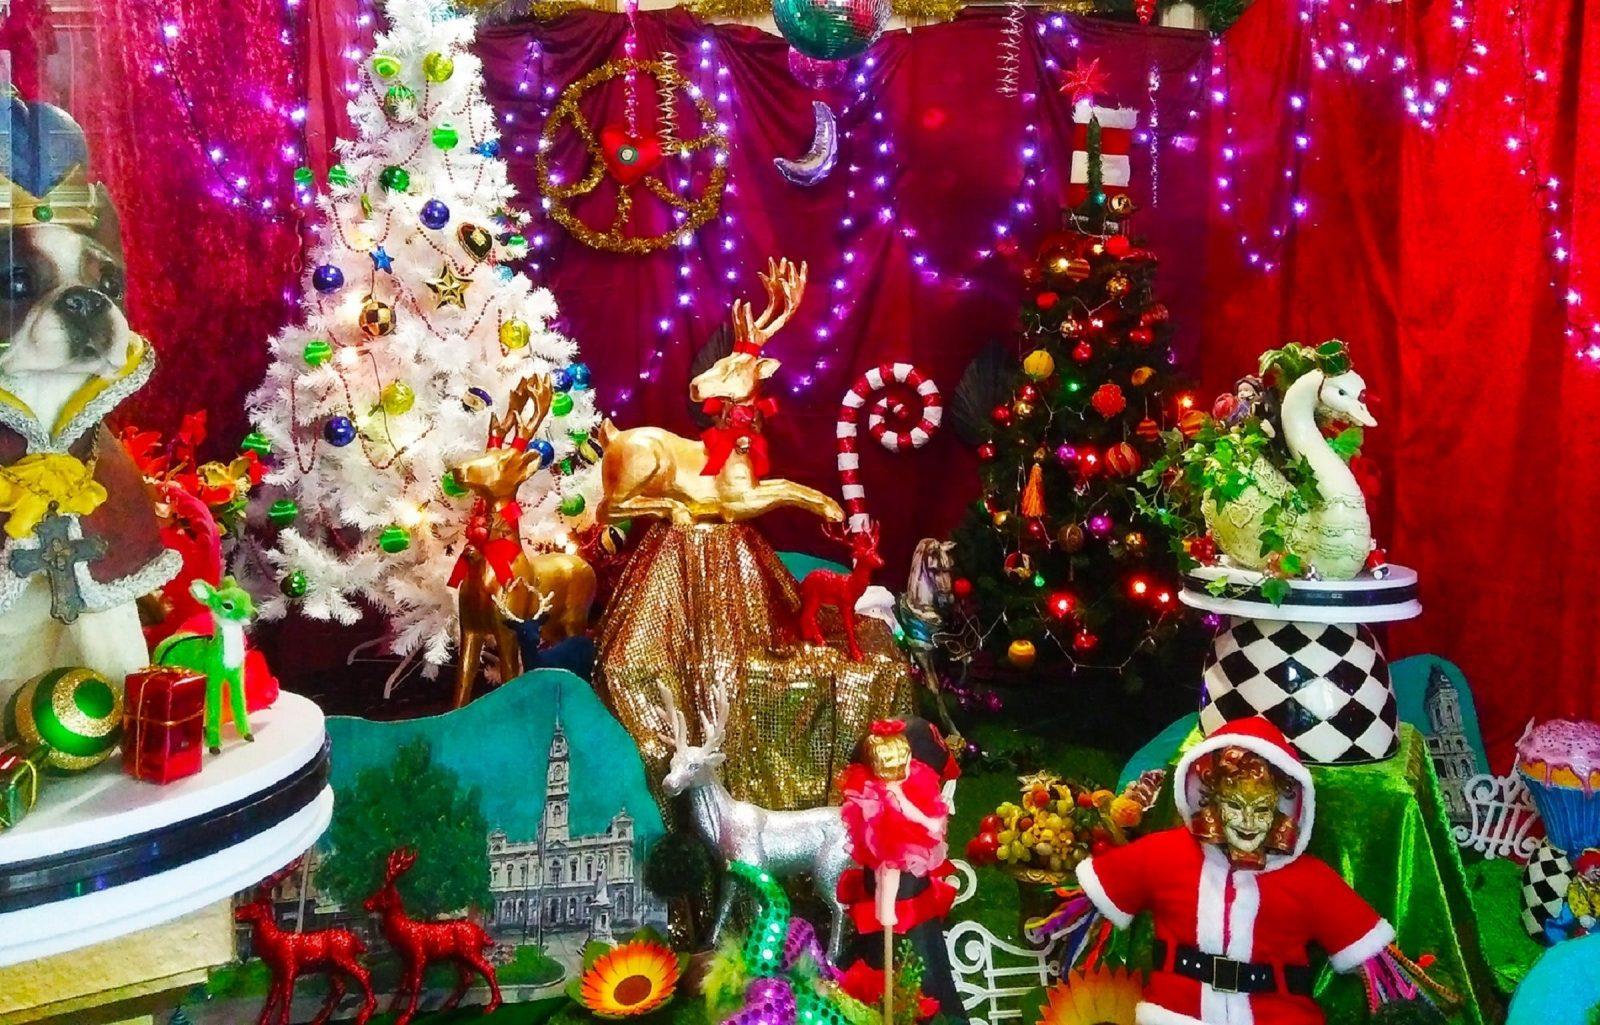 12 Days of Christmas Windows